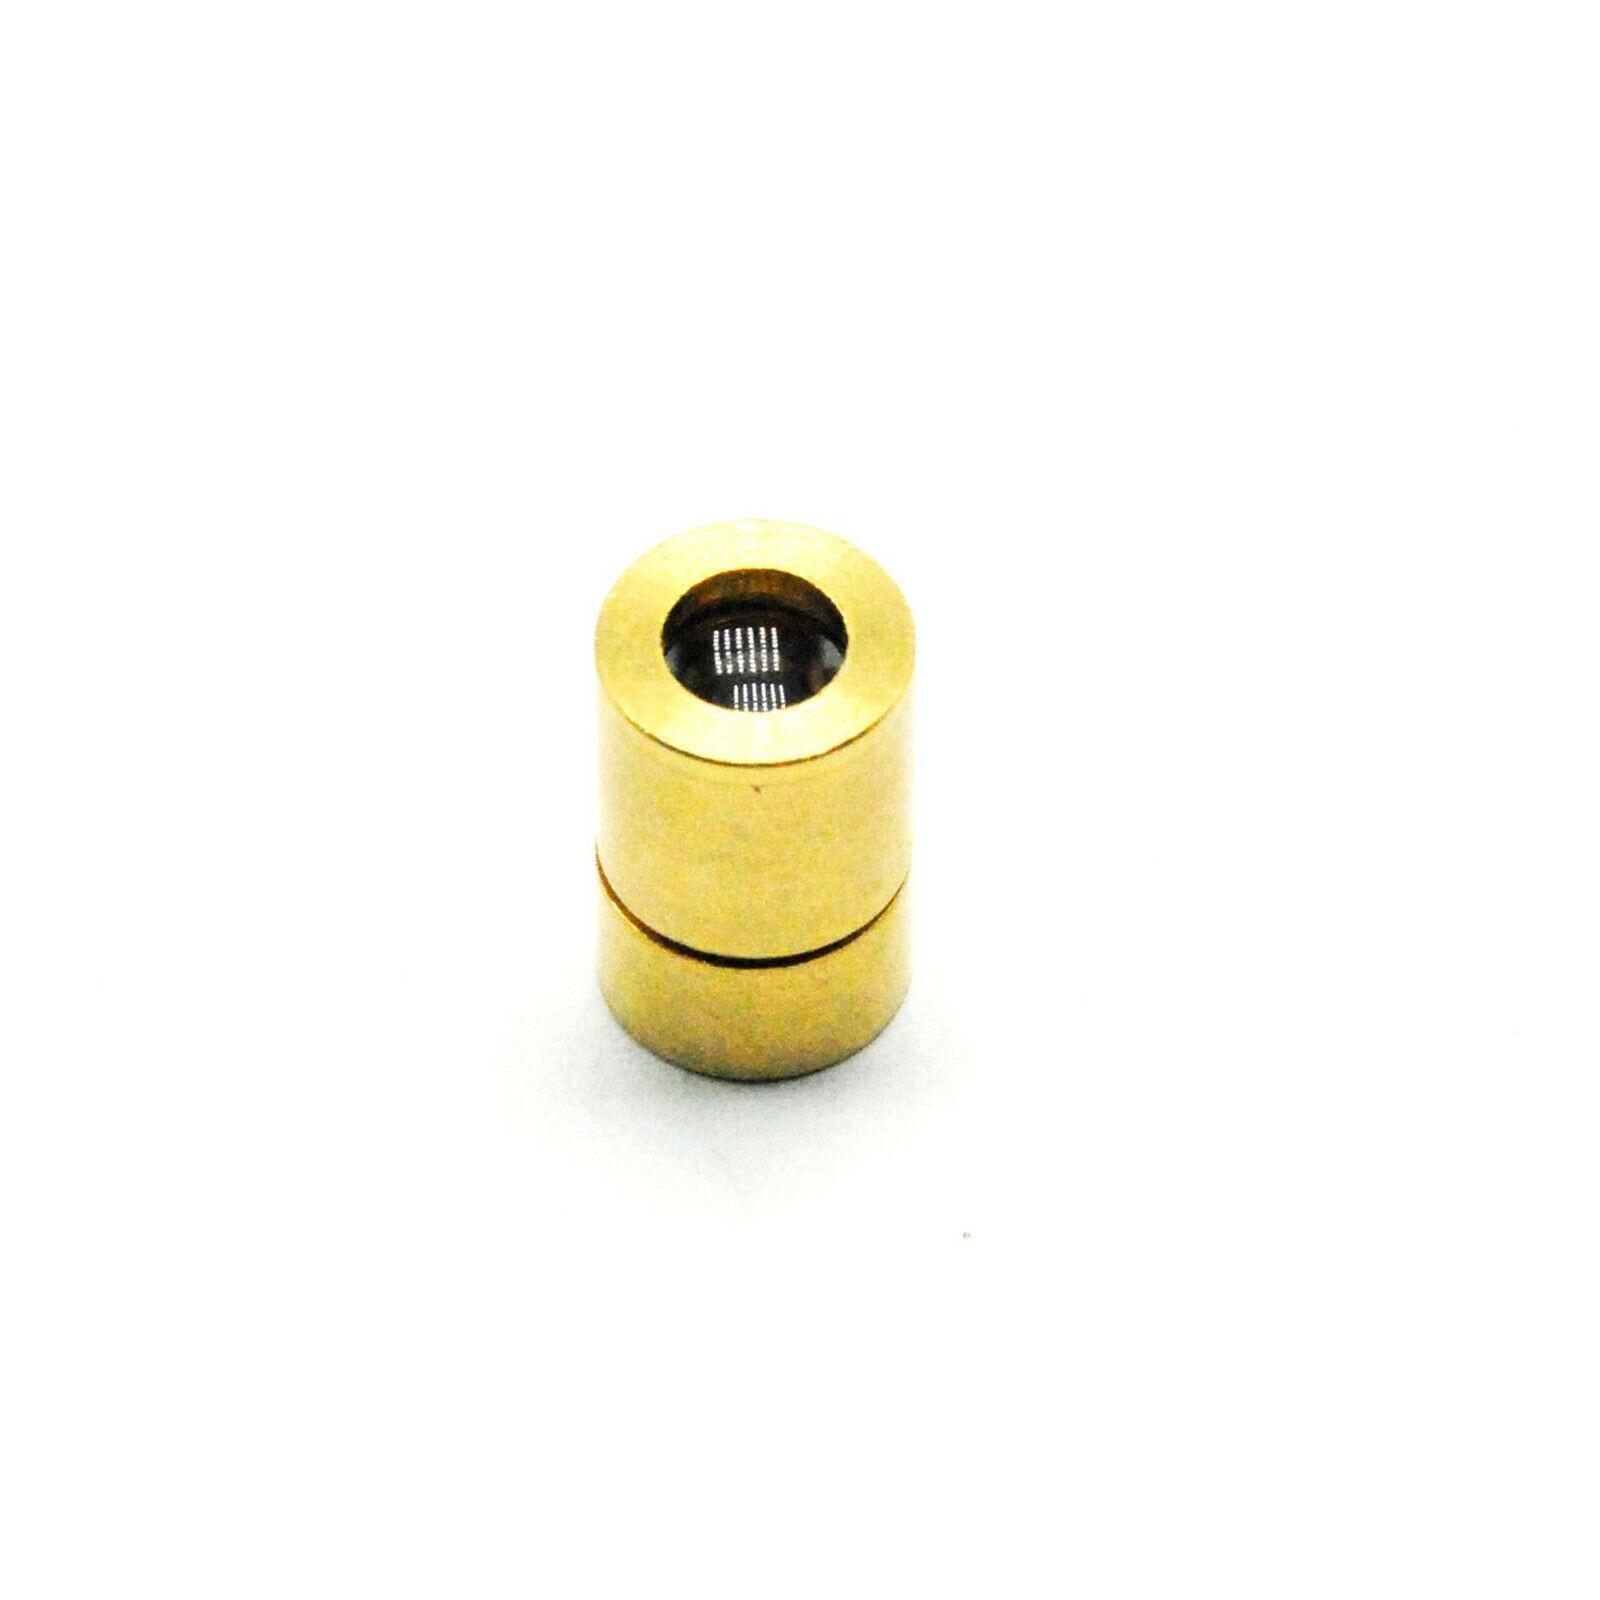 20шт 8x13 мм мини корпус для 5,6 мм ТО-18 лазер диод с 7 мм коллимирующий объектив